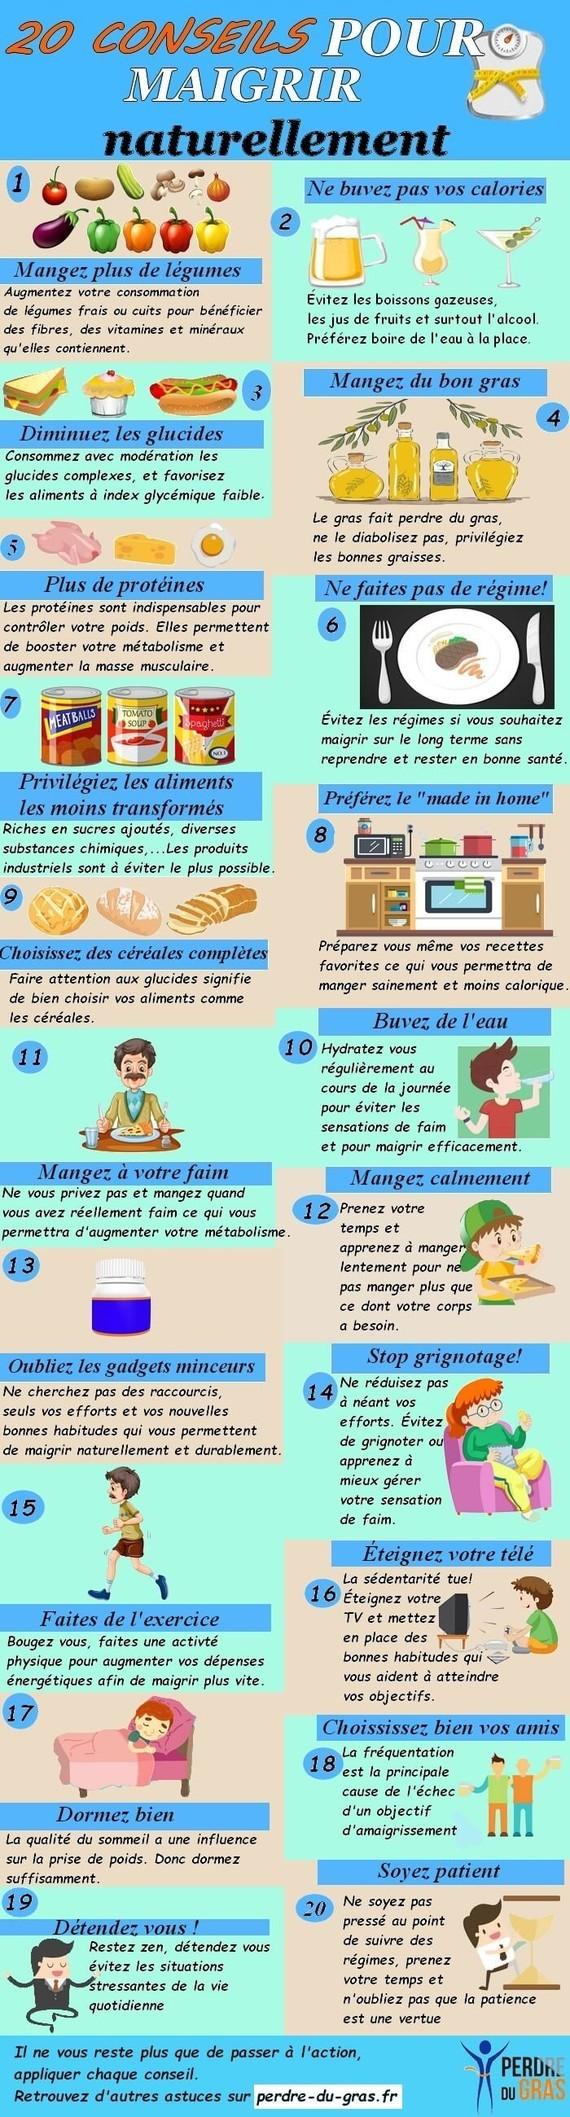 20 conseils pour maigrir (infographie)-